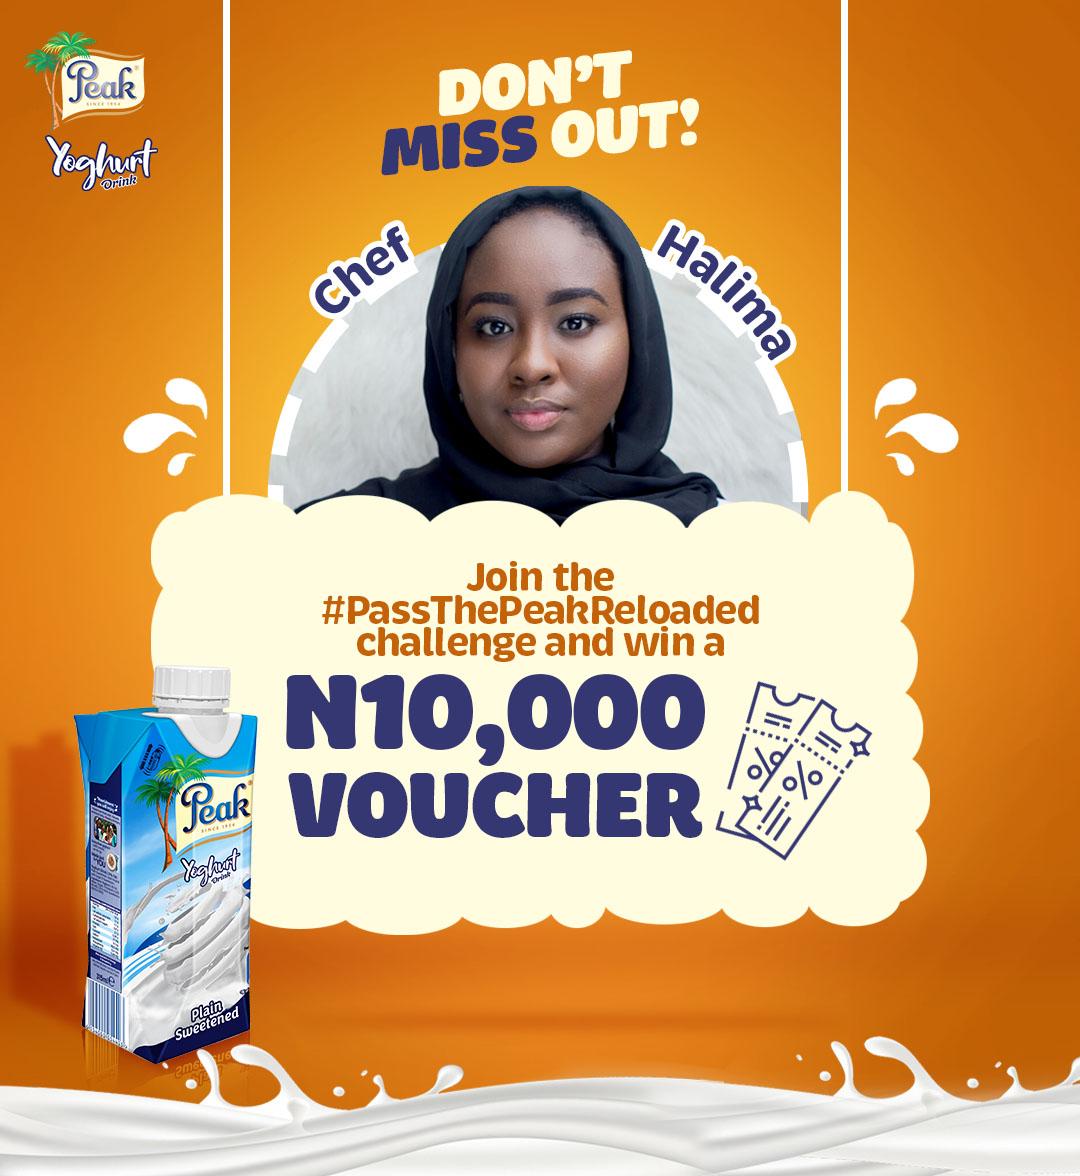 Win N10,000 in #PassThePeakReloaded Challenge, By Peak Yogurt.